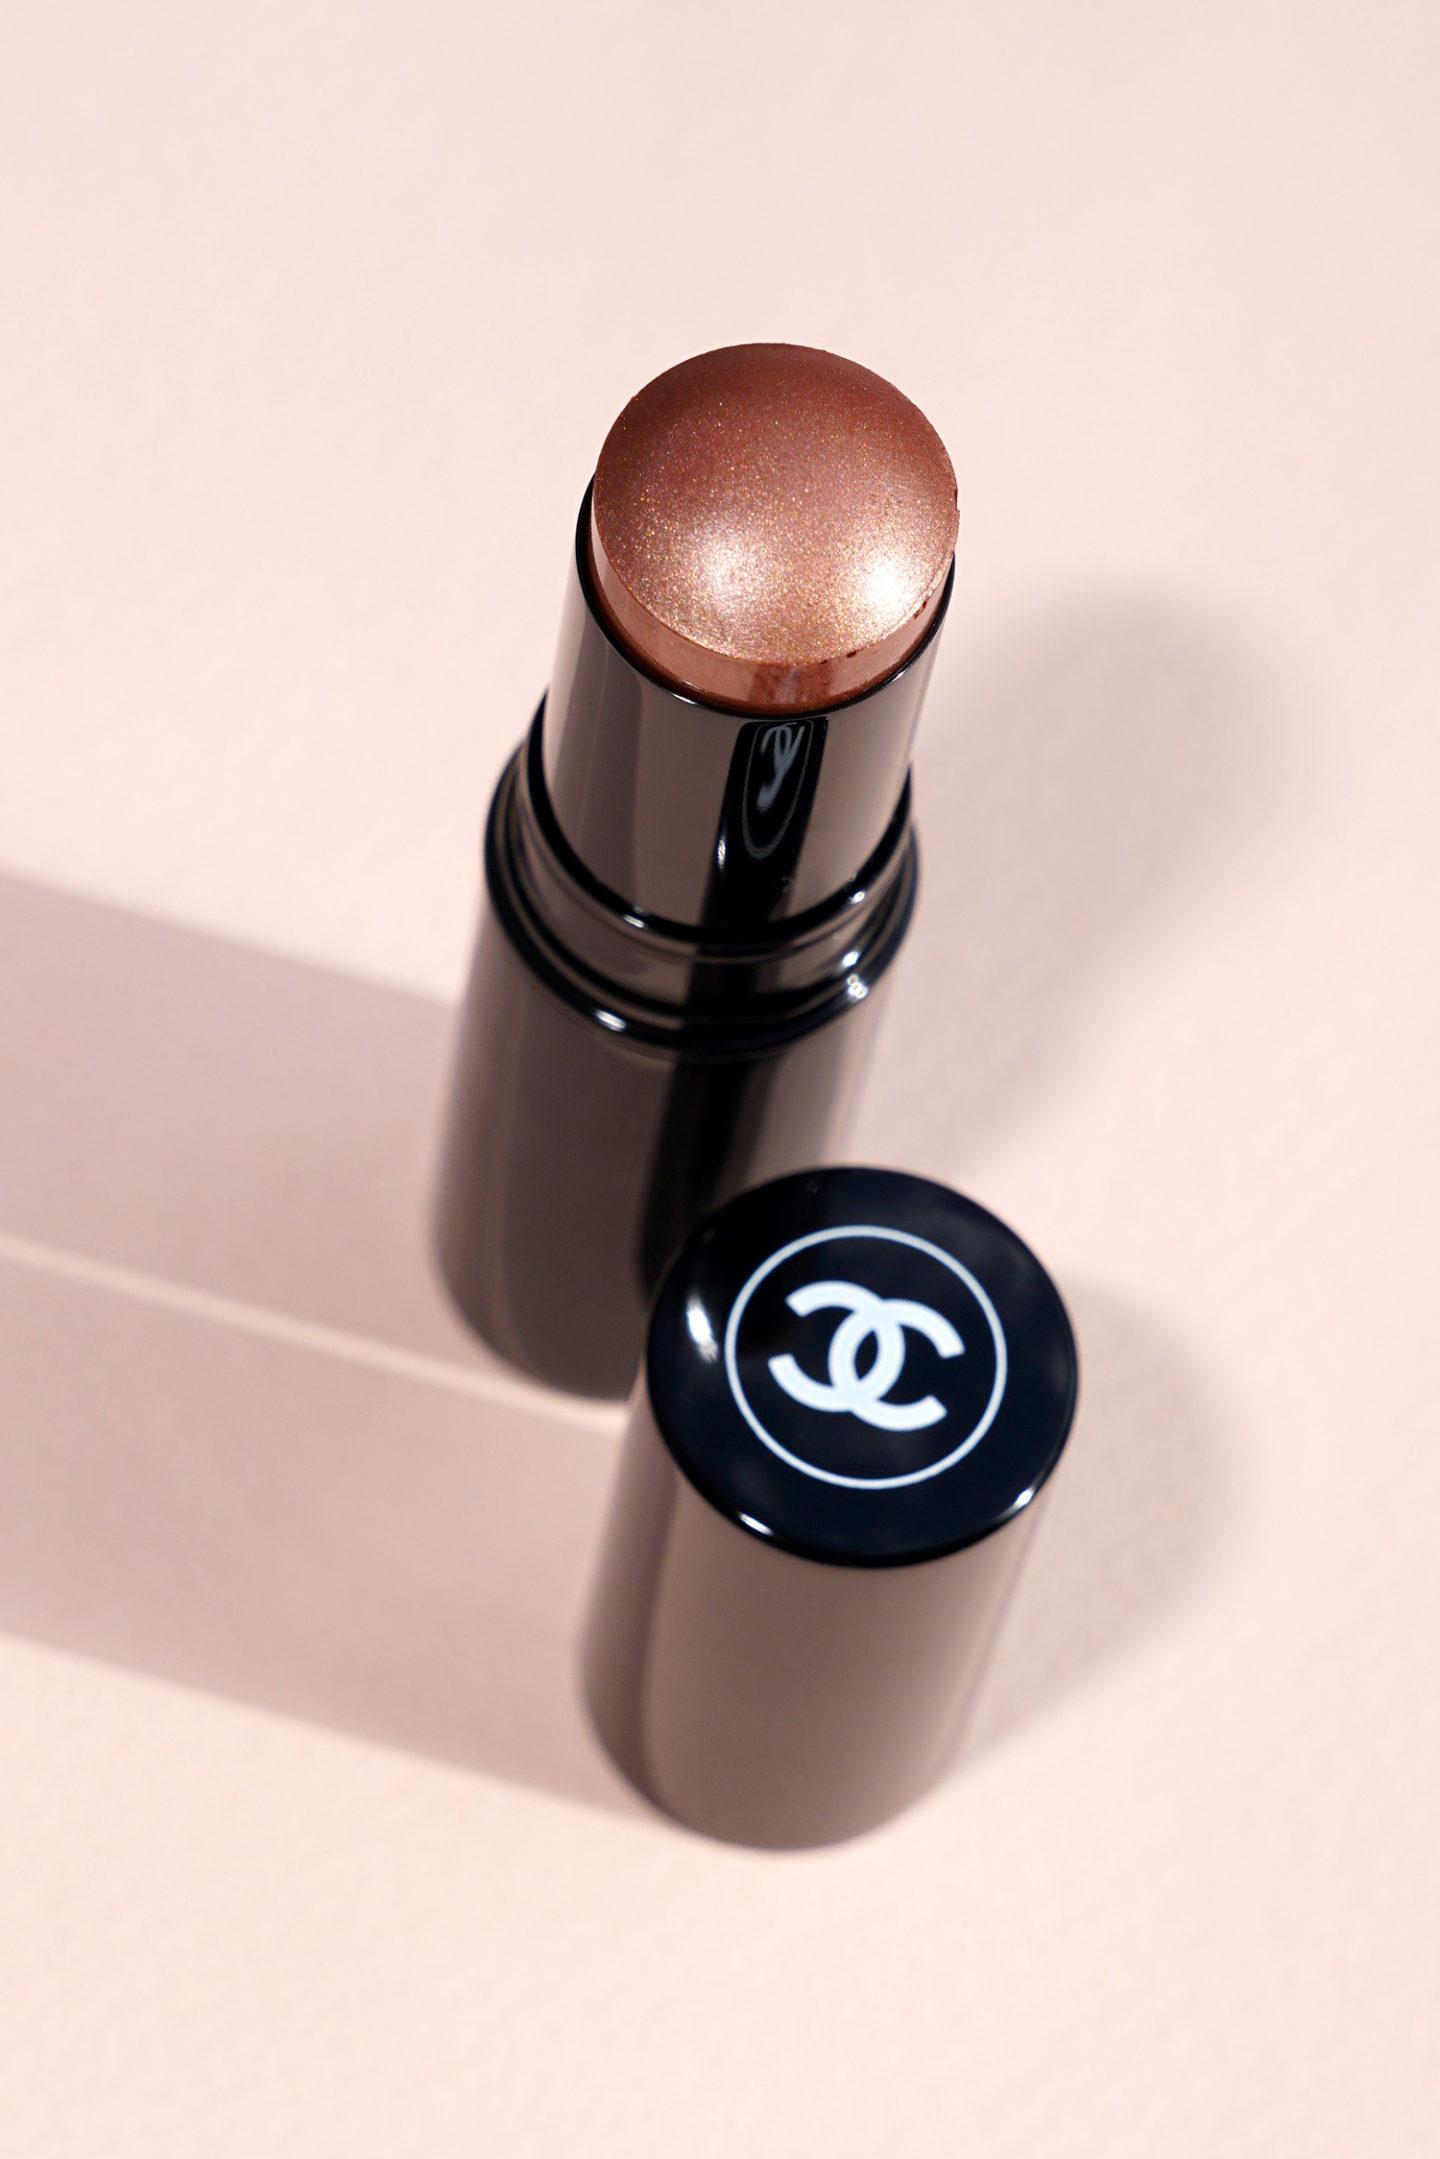 Chanel Printemps 2020 Baume Essentiel Golden Light